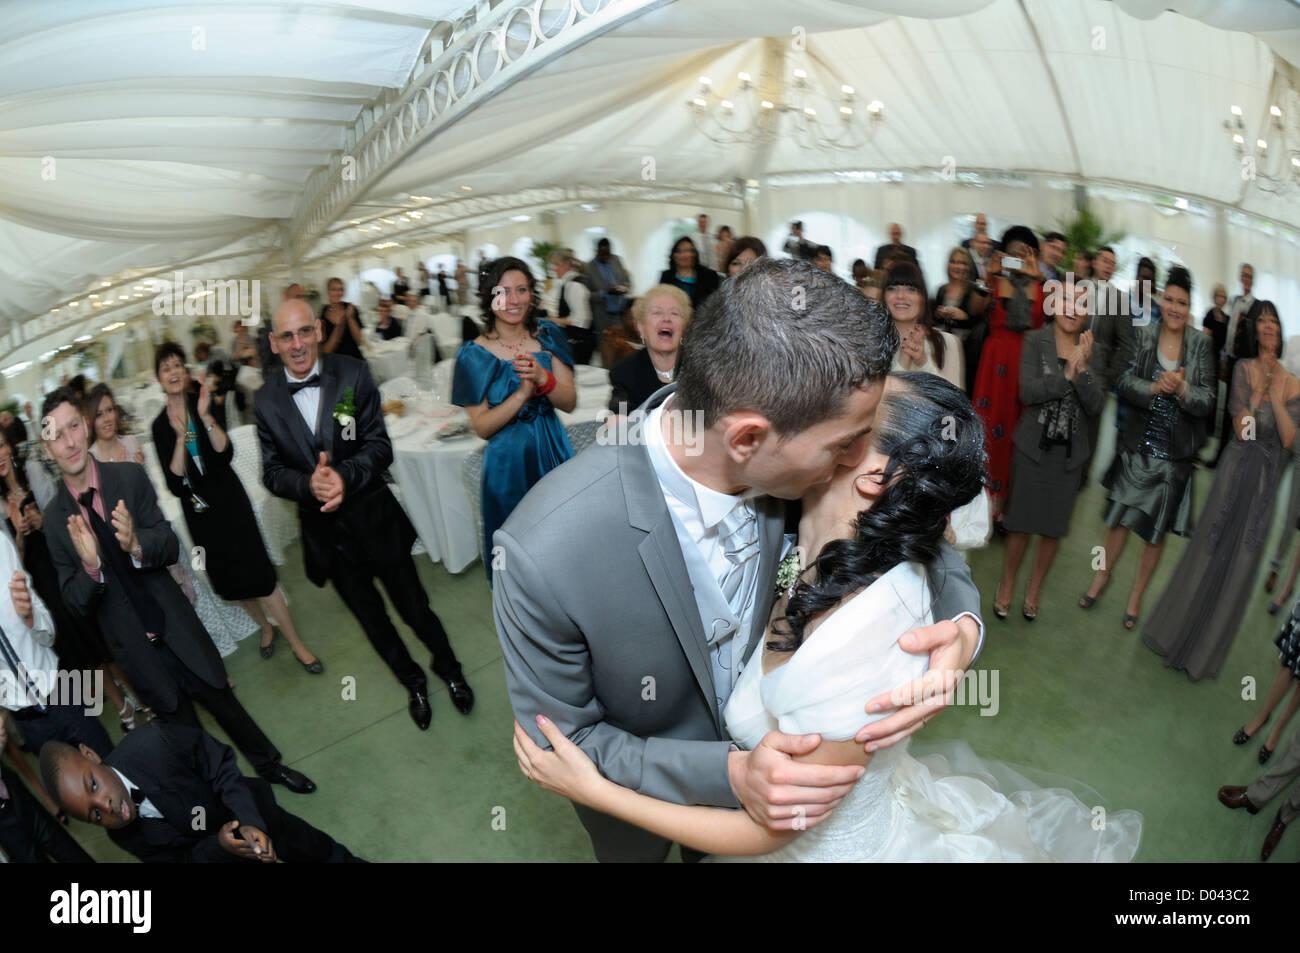 Fête de mariage, Florence, Toscane, Italie Photo Stock